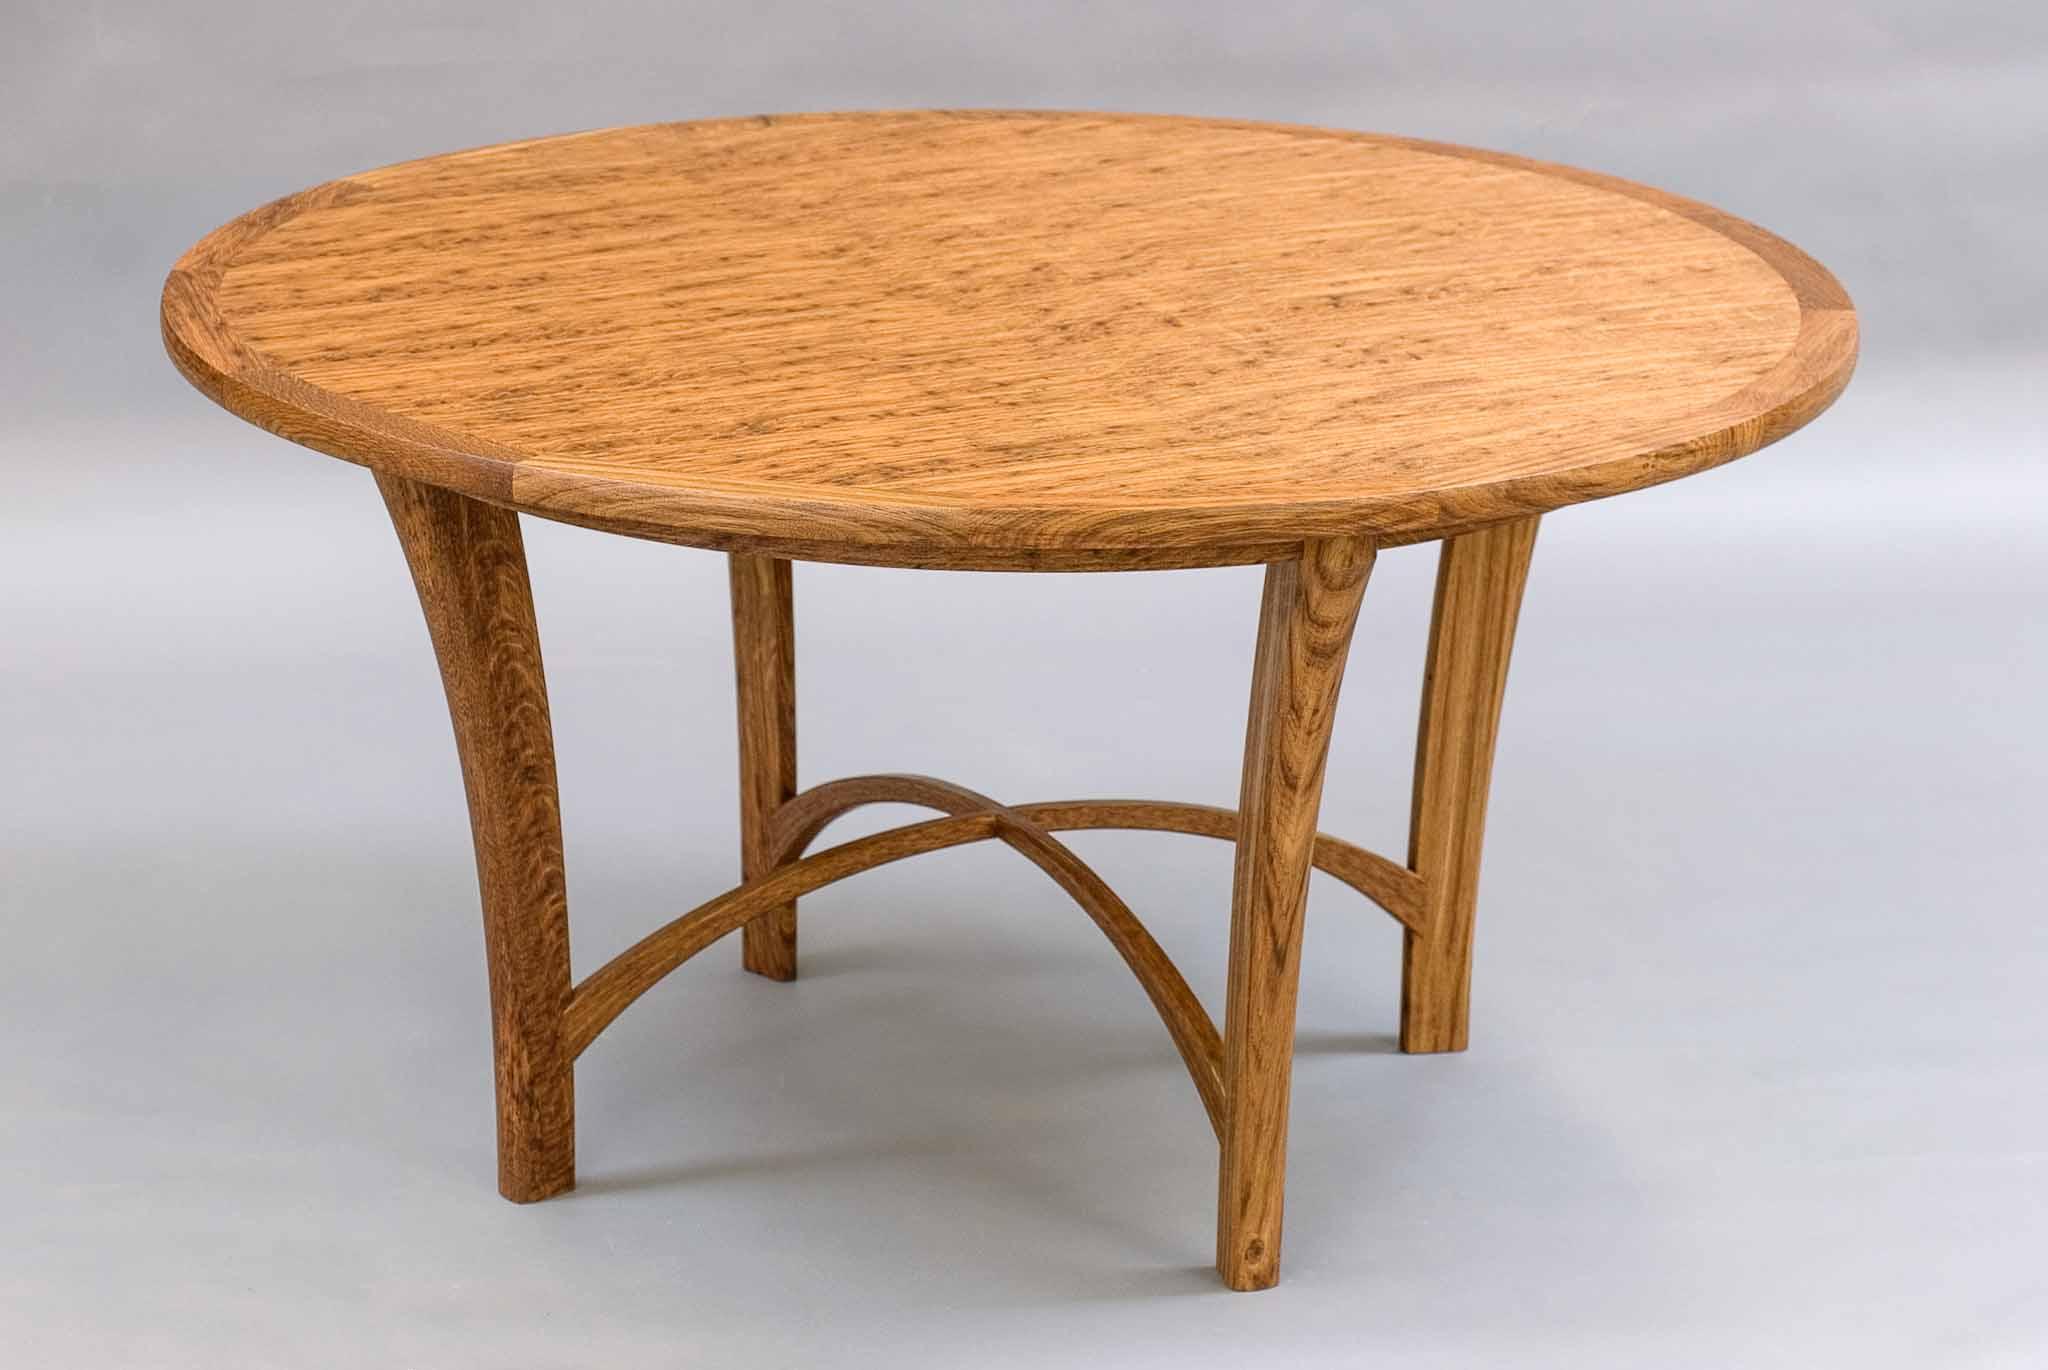 veneered circular table